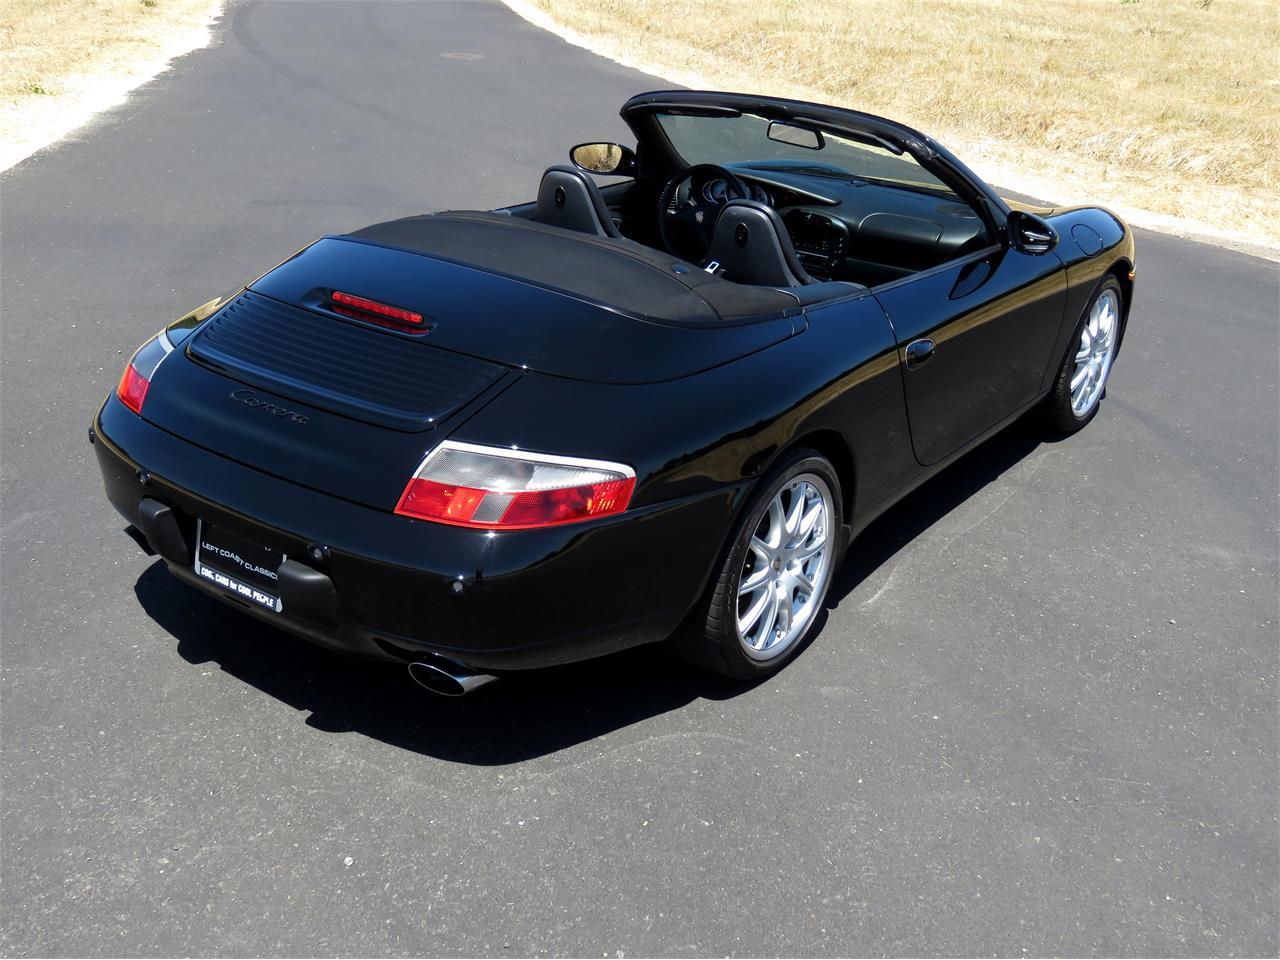 911 carrera 1999 porsche cc cabriolet classic financing inspection insurance transport sonoma california